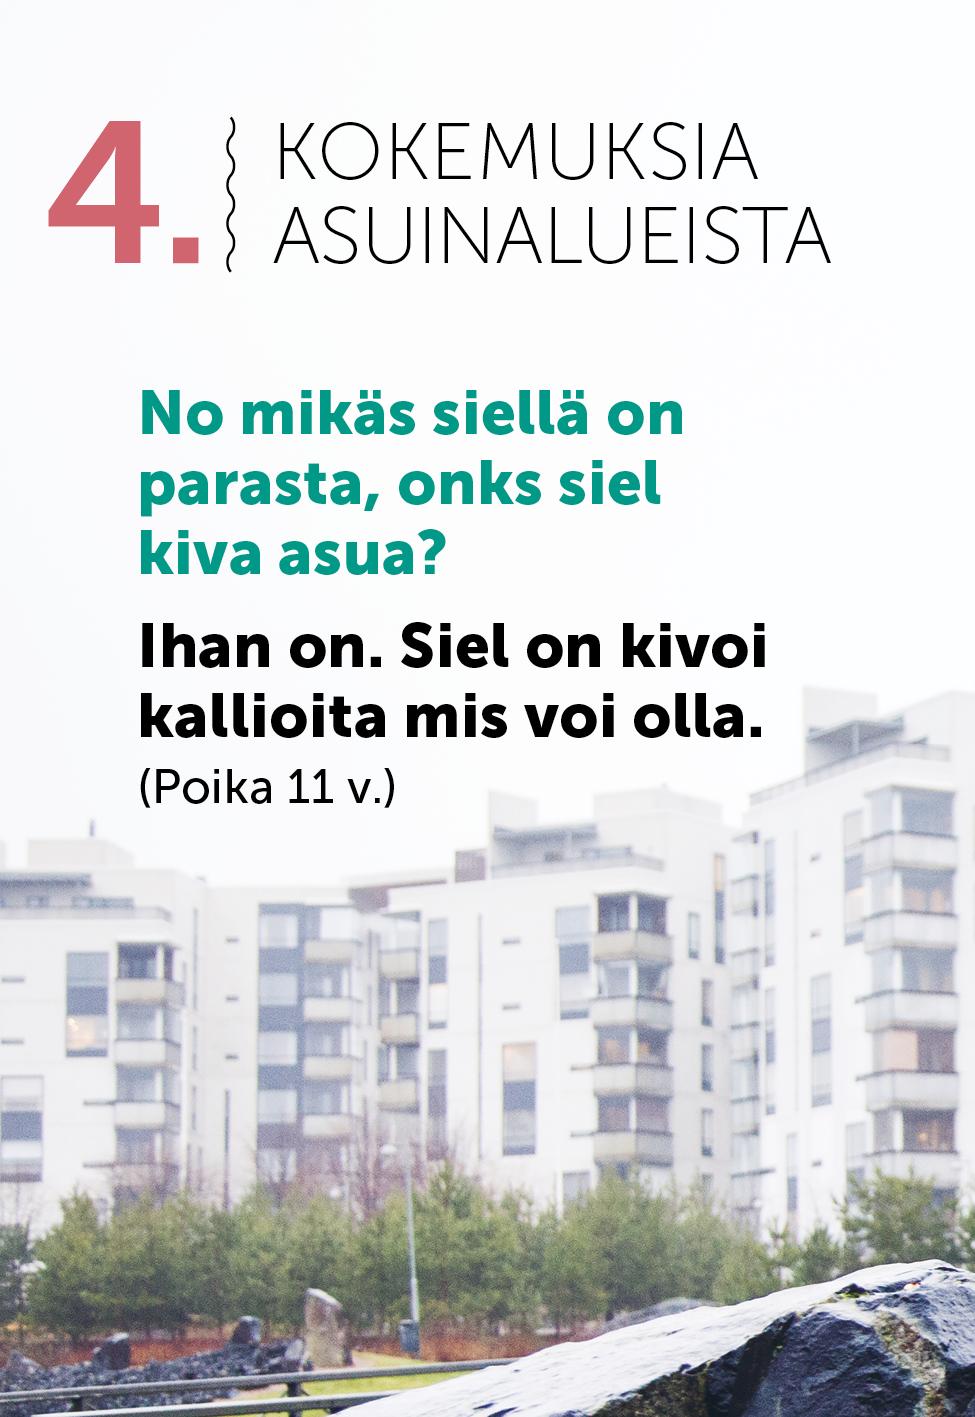 150330_NuHa_raportti_portfolioon_6